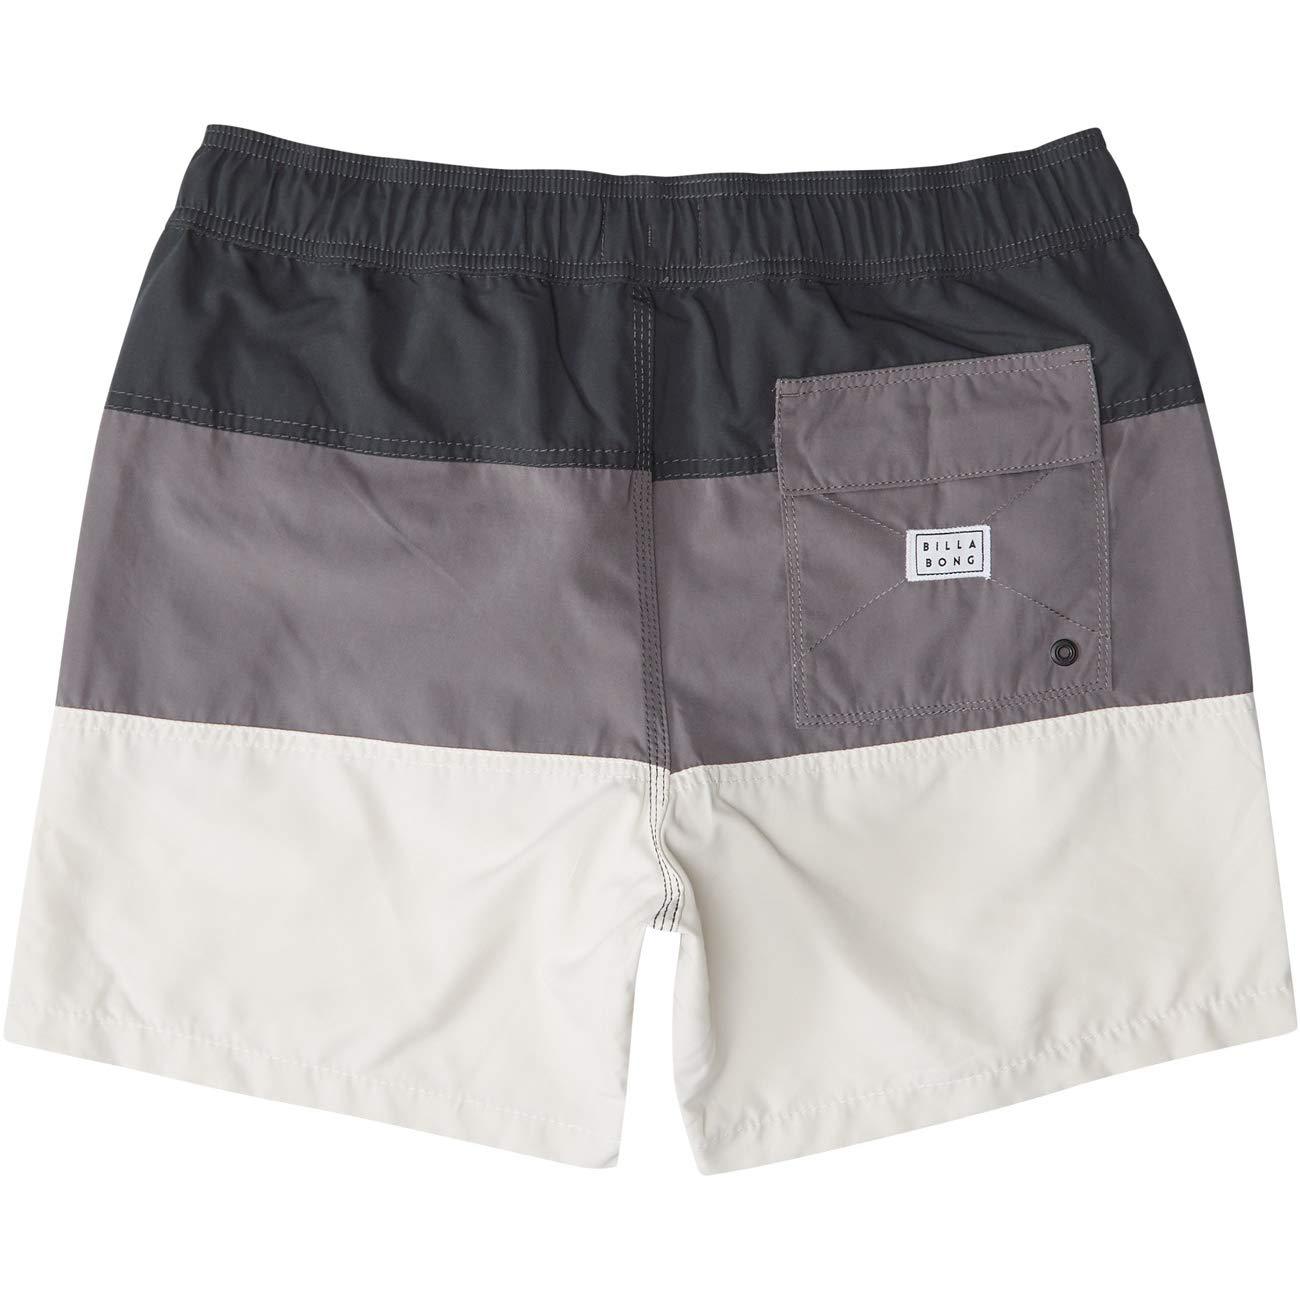 BILLABONG Herren Shorts Tribong Layback Shorts B07NHKQD2Q B07NHKQD2Q B07NHKQD2Q Badeshorts Elegant fb504e